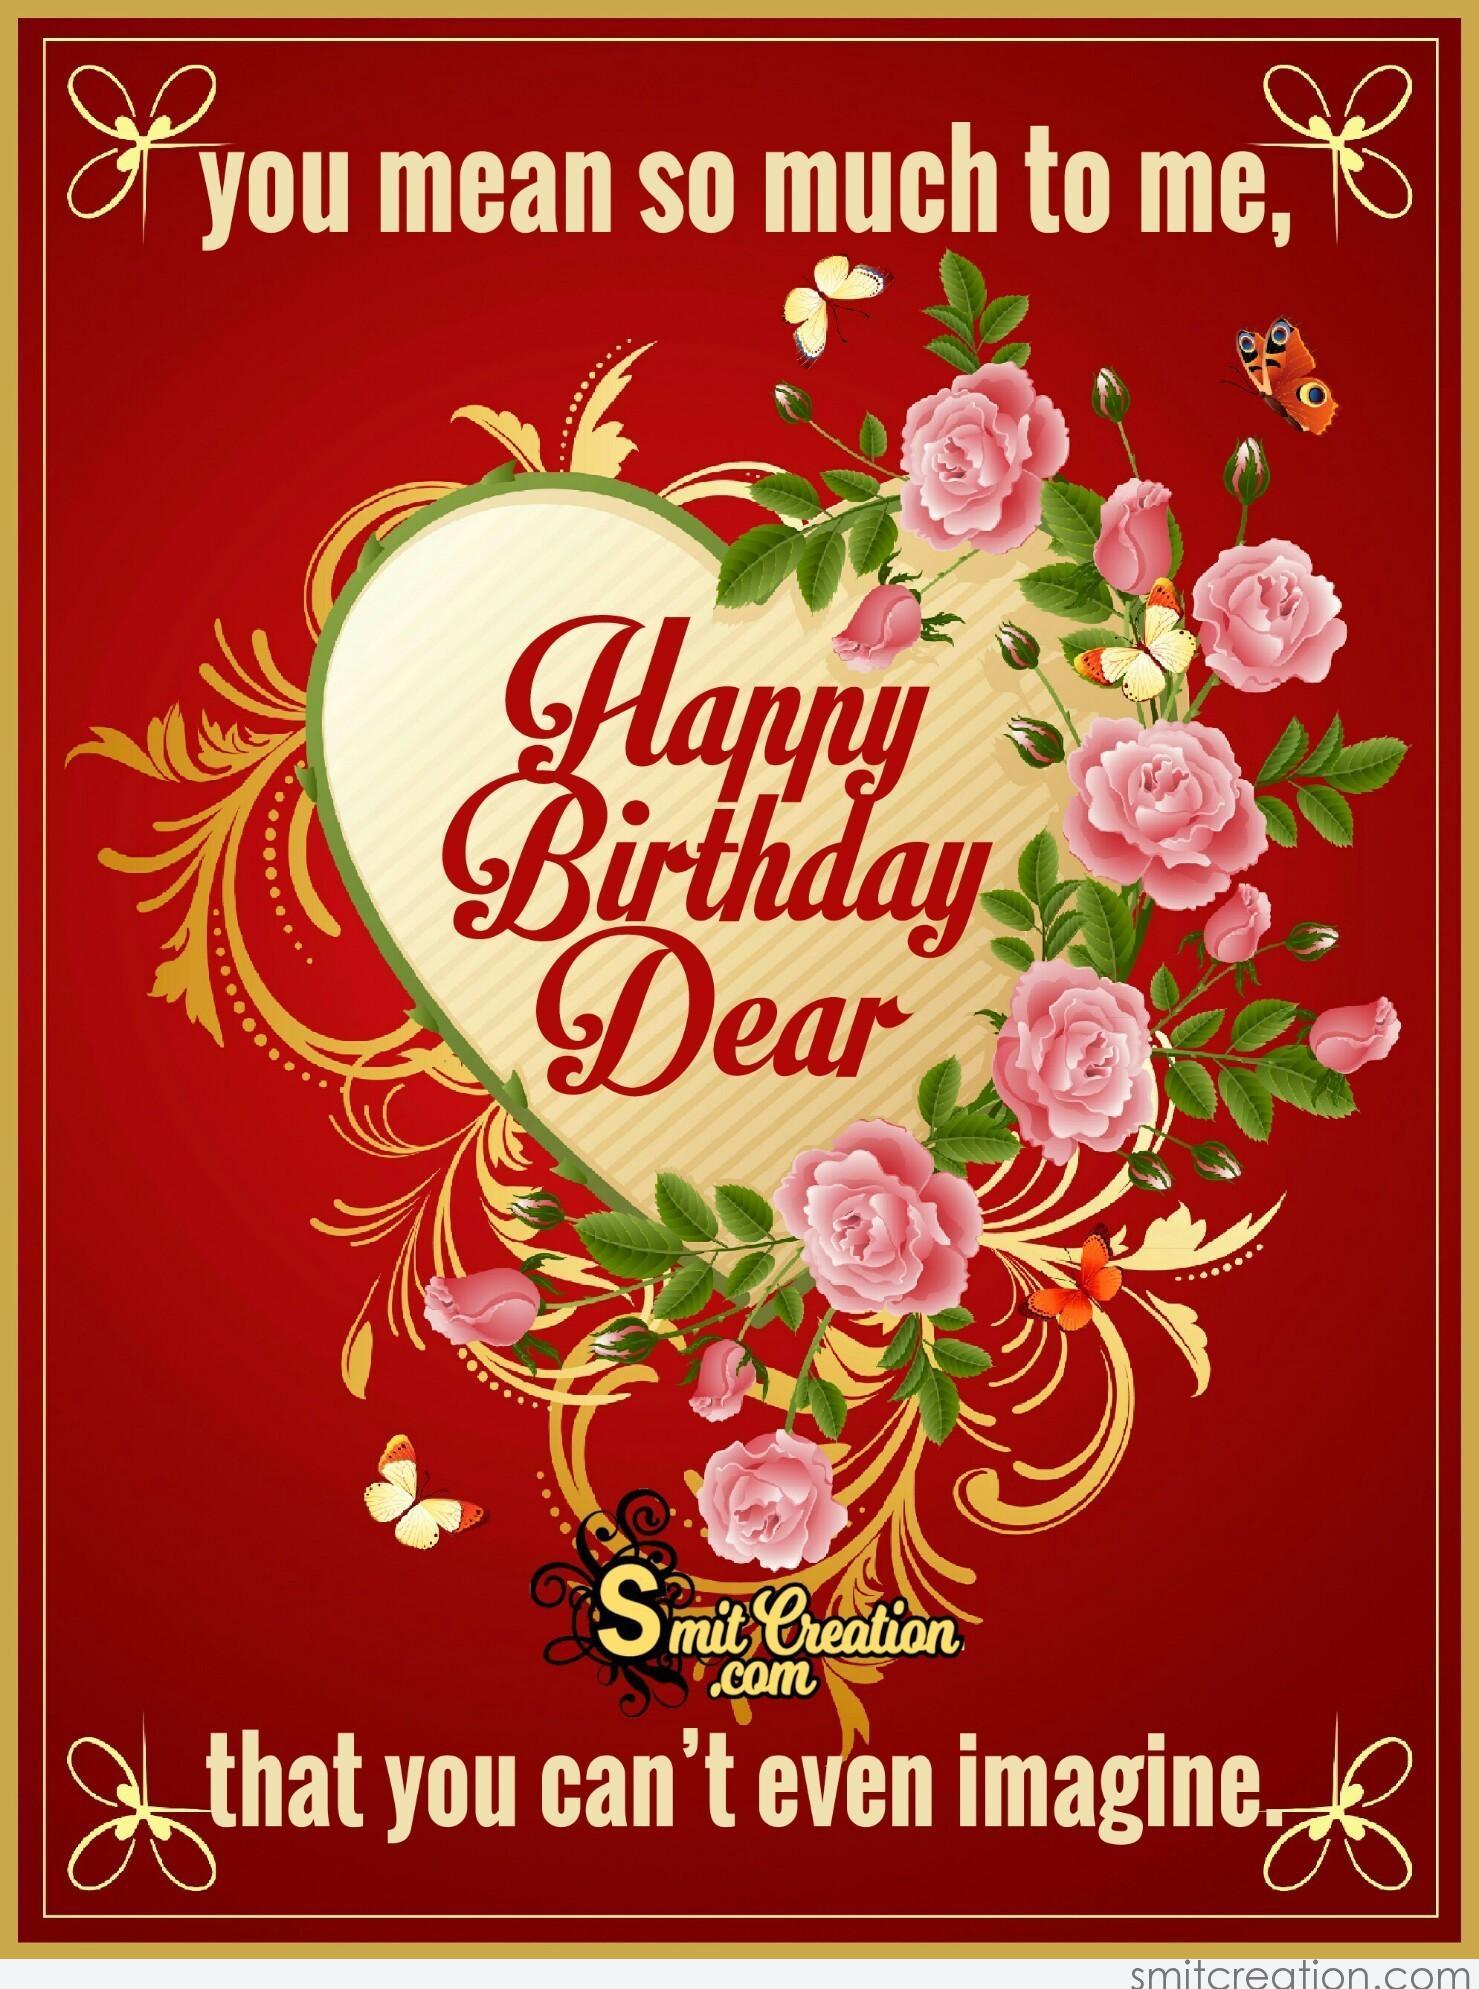 Birthday and Graphics SmitCreation